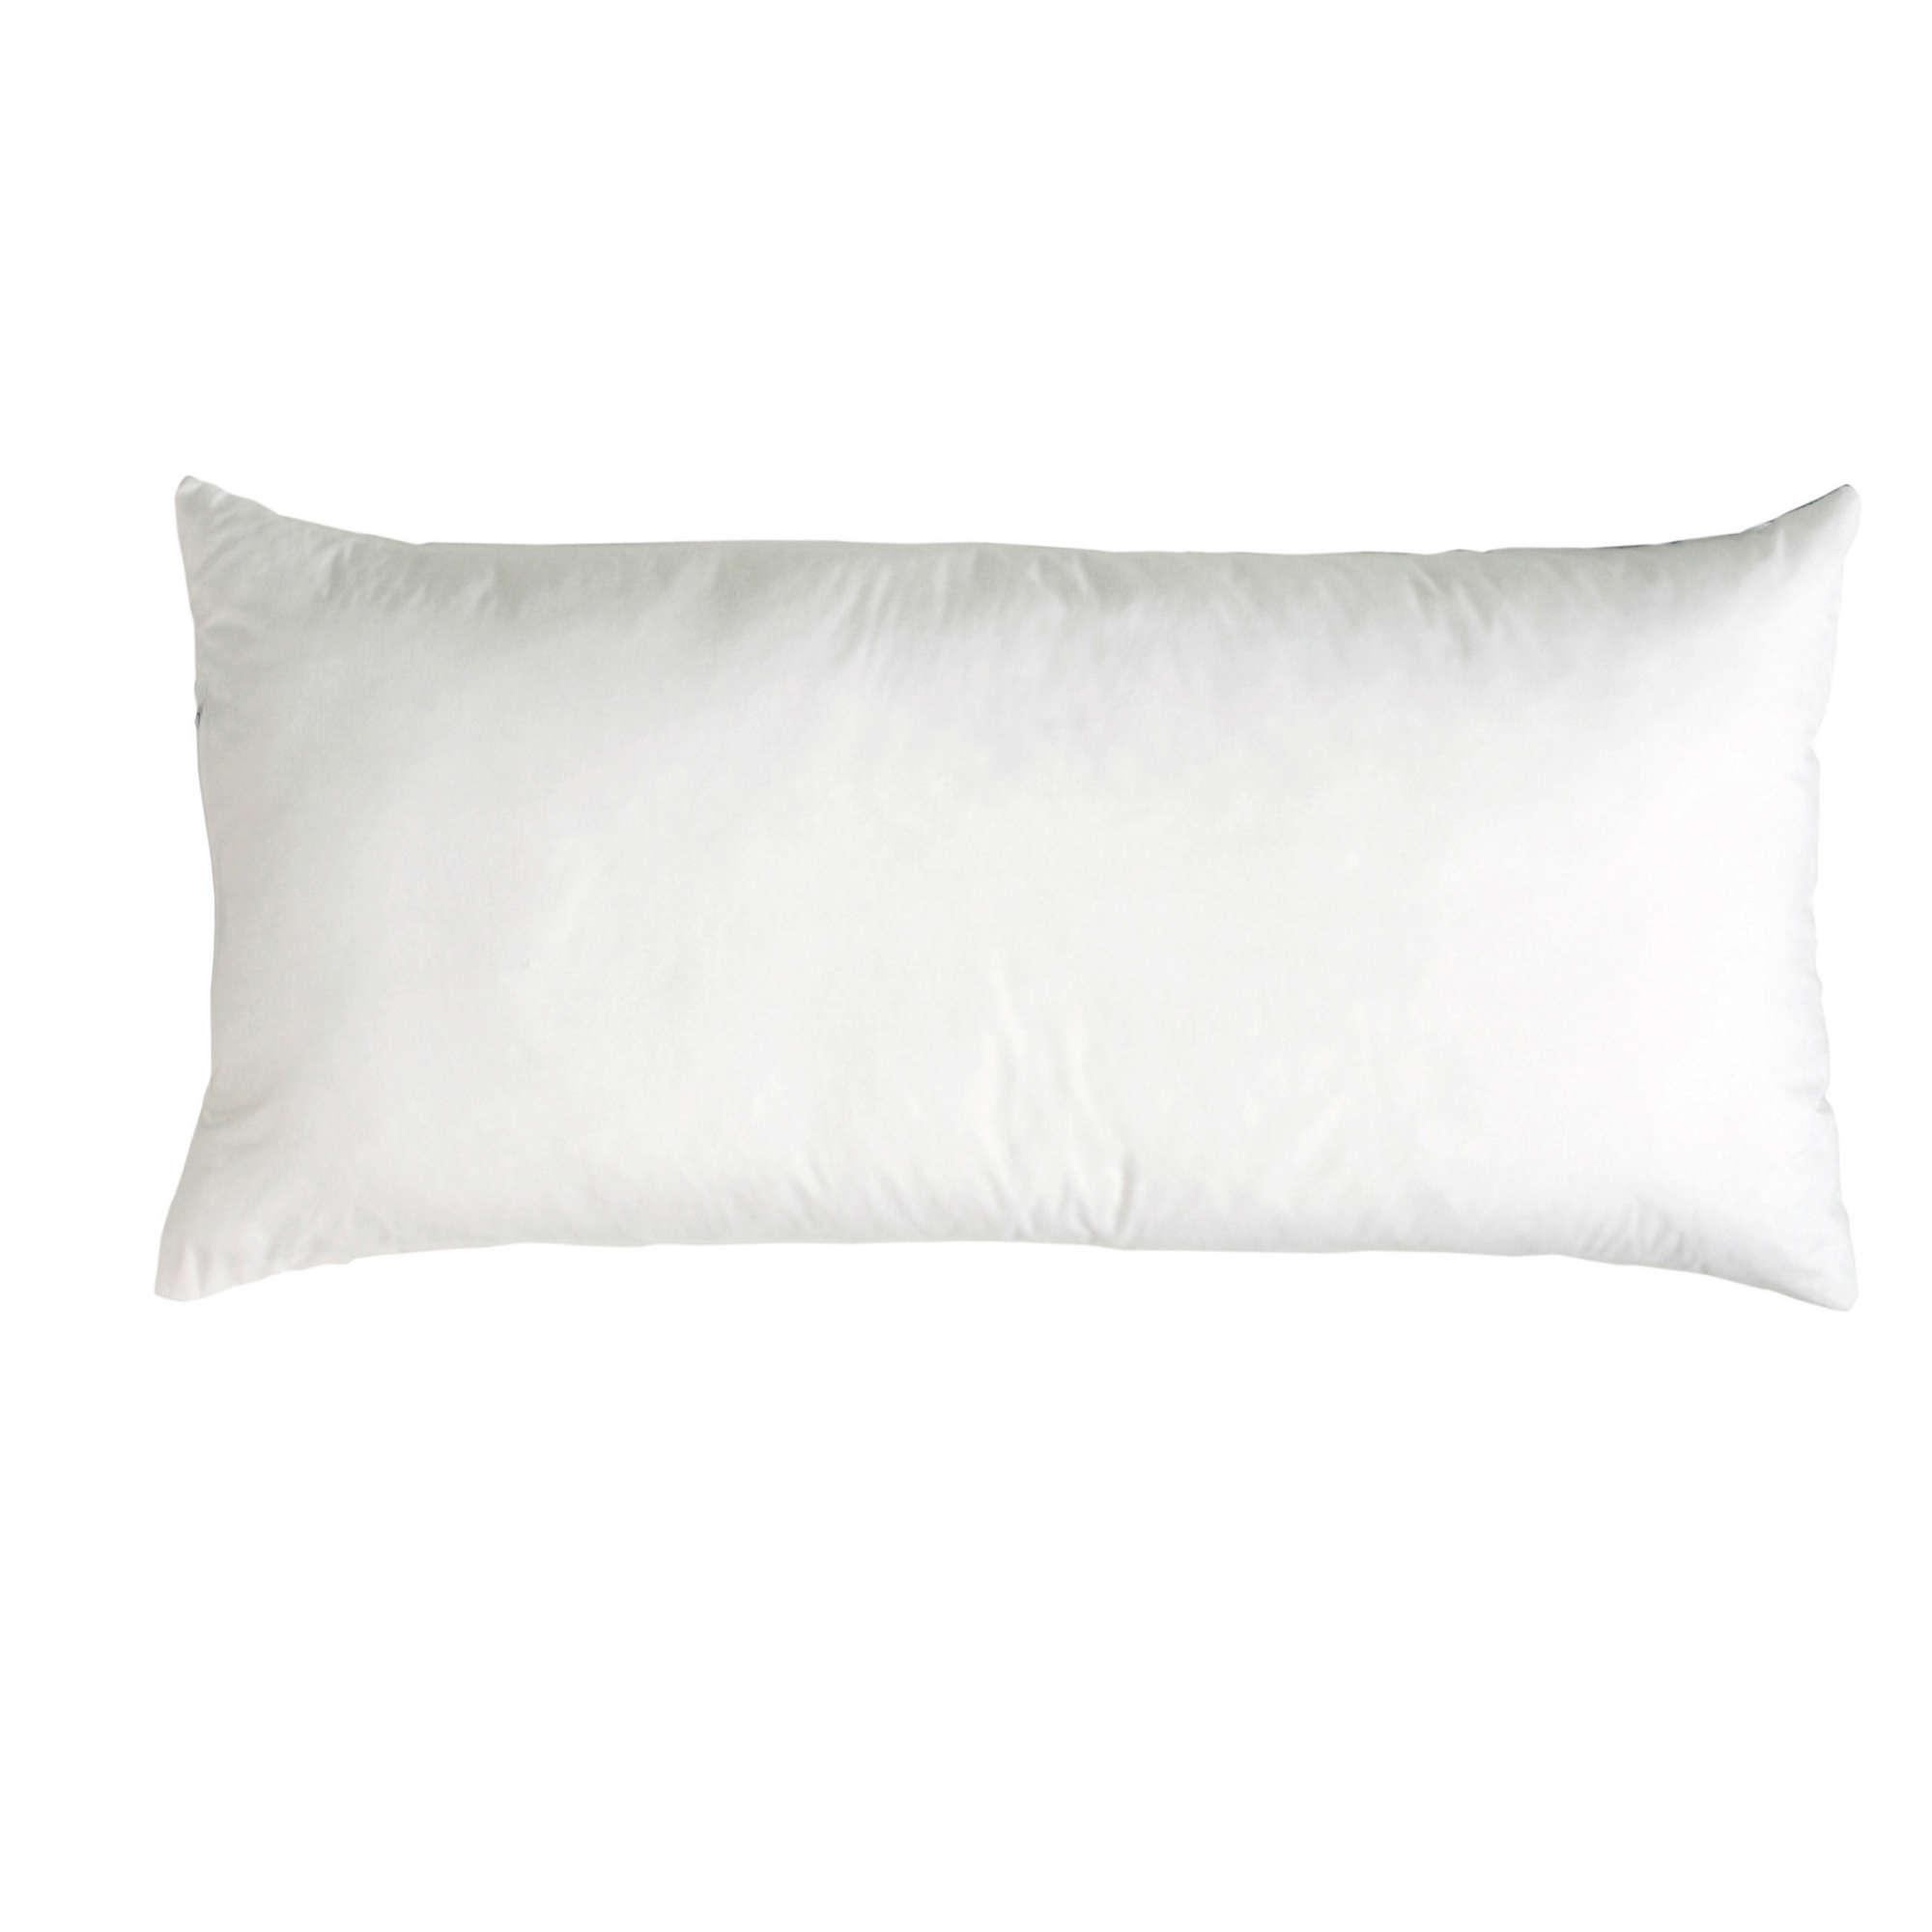 centa star polar gold kopfkissen 85 federn 15 daunen daunen feder ebay. Black Bedroom Furniture Sets. Home Design Ideas